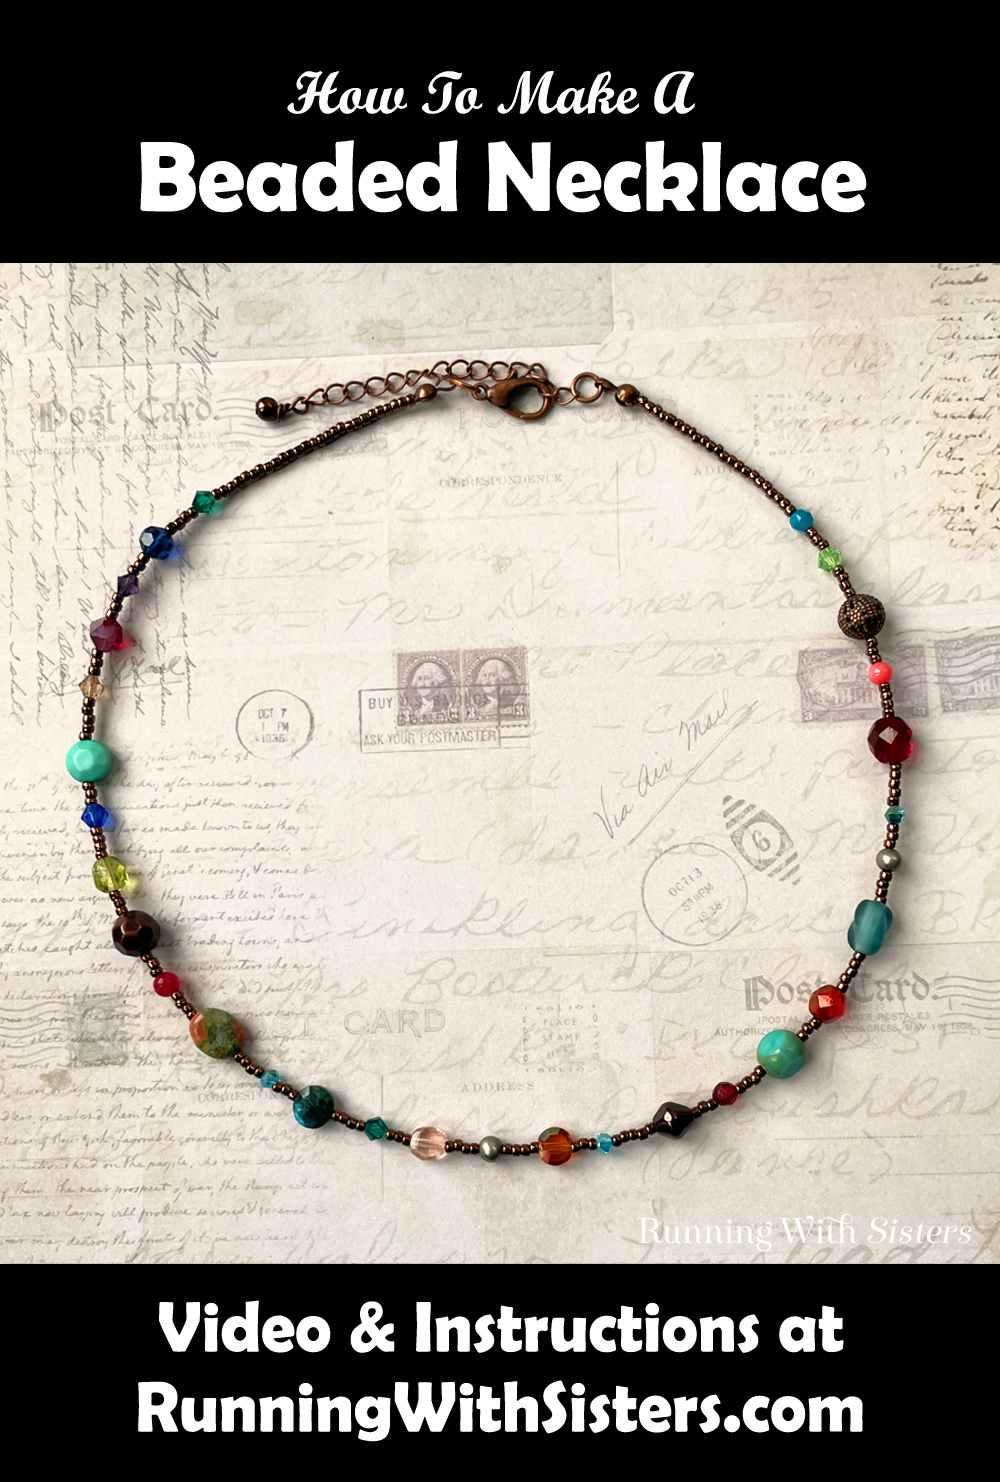 Calliope Beaded Necklace Pinterest